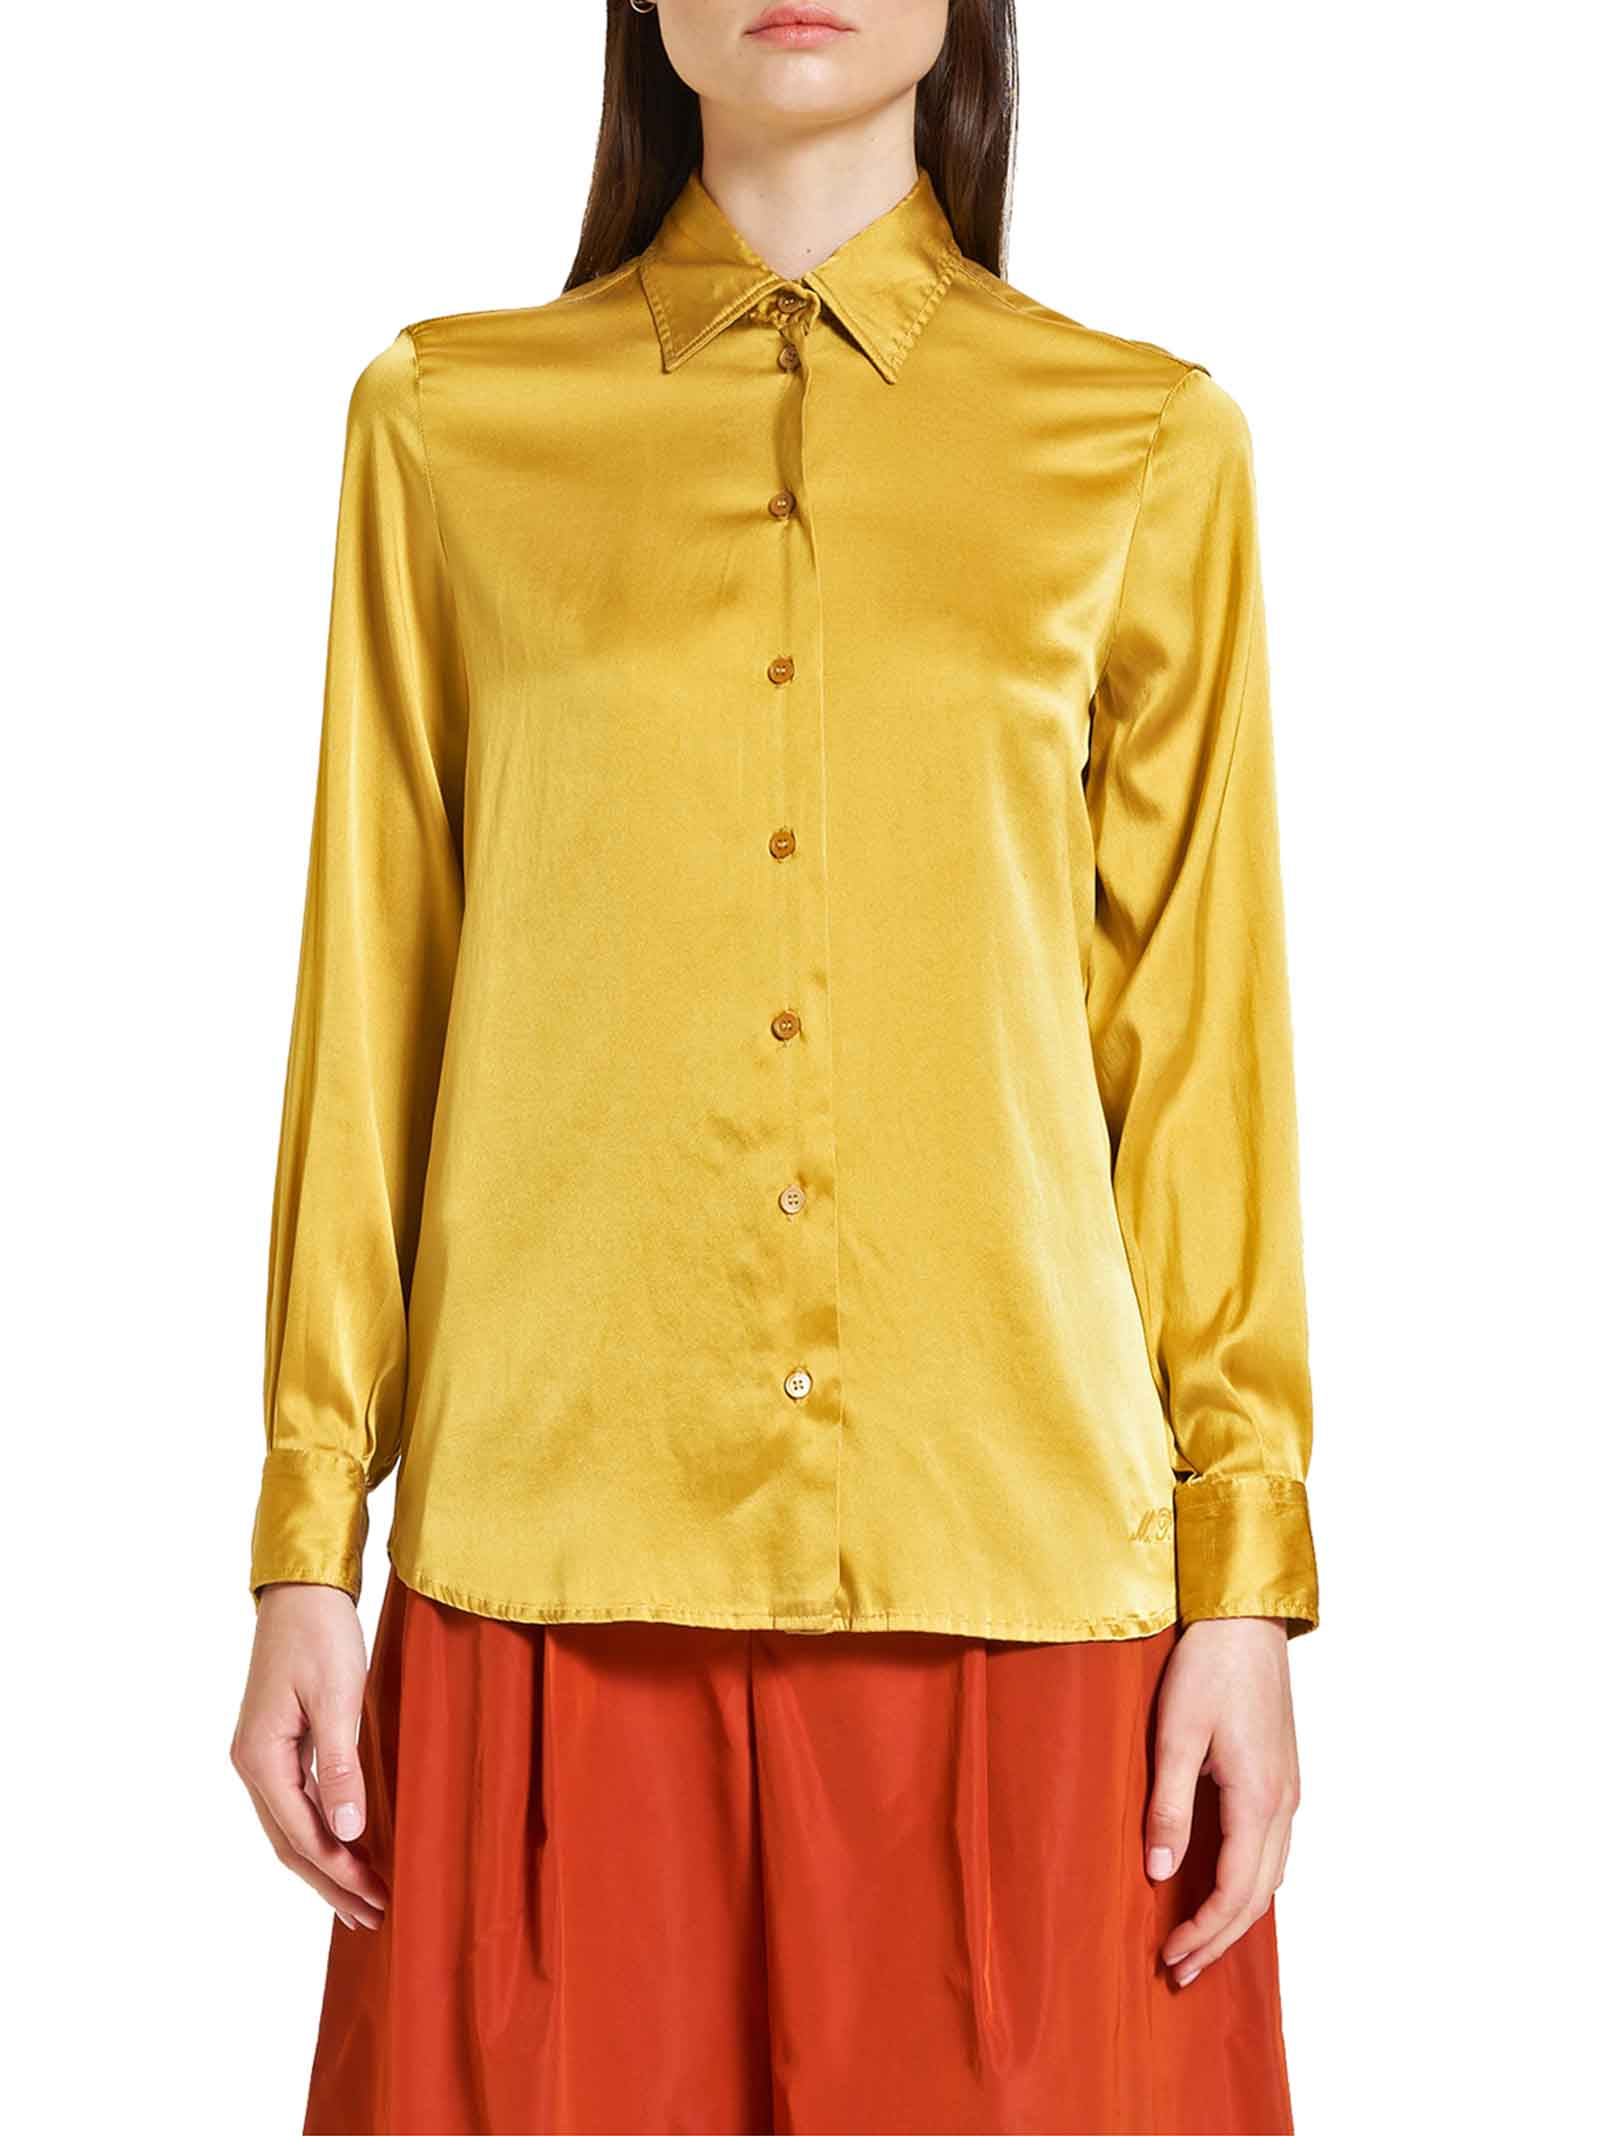 Women's Clothing 100% Pure Silk Satin Shirt Mustard Long Sleeves Maliparmi   Shirts and tops   JM21443102070013